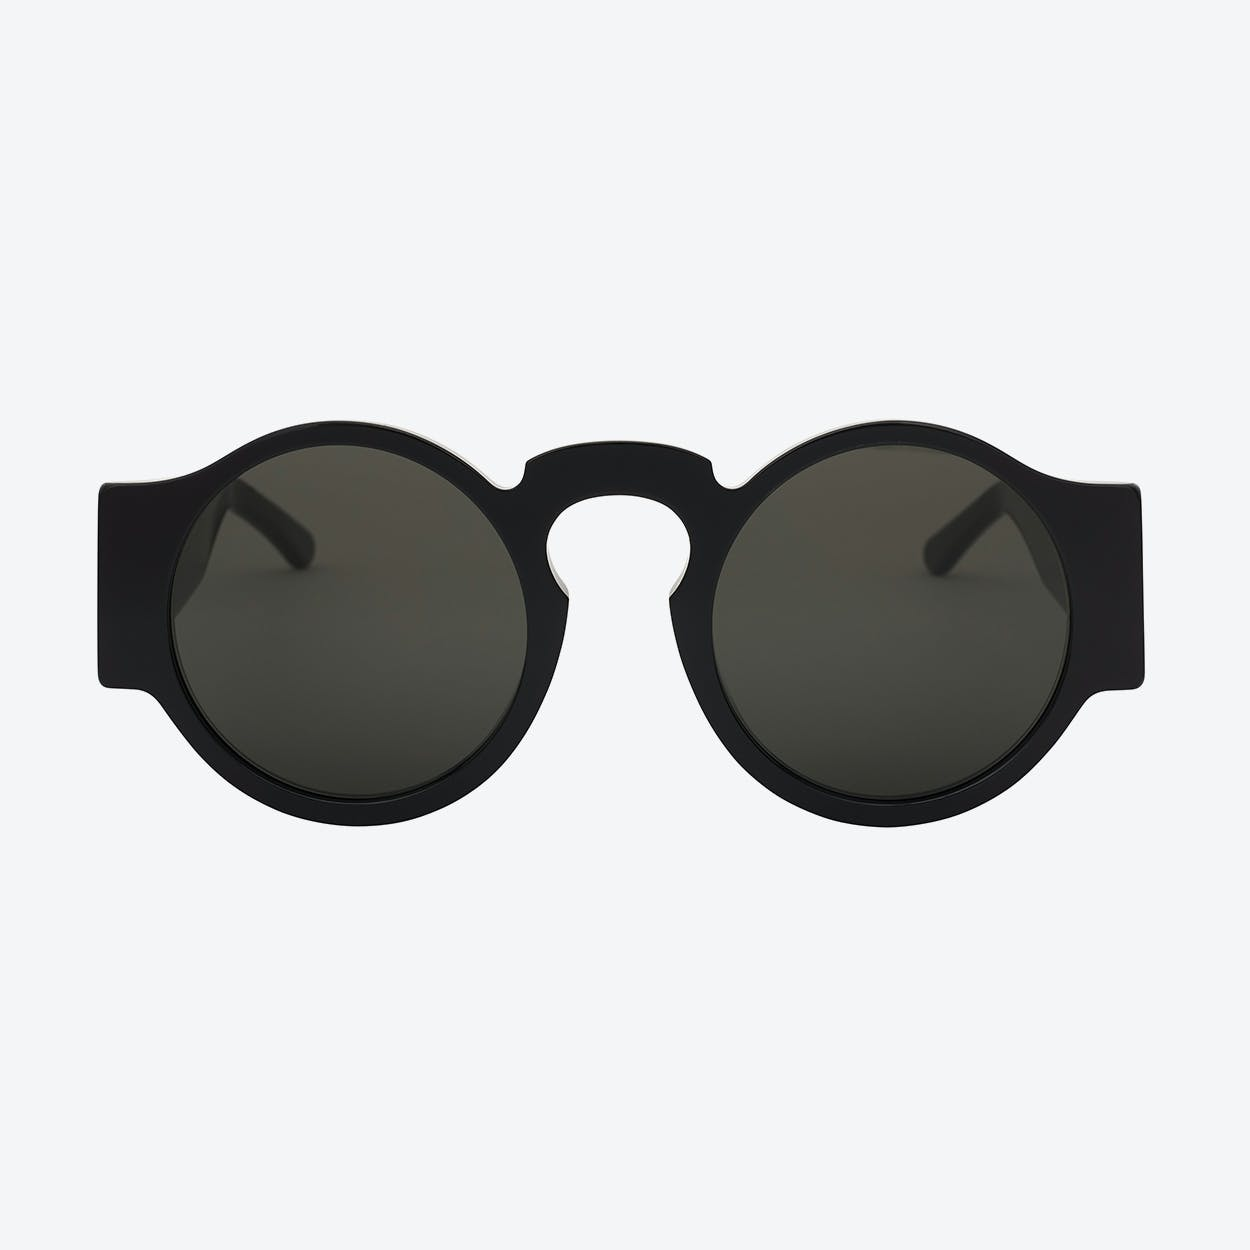 Didac Sunglasses in Black